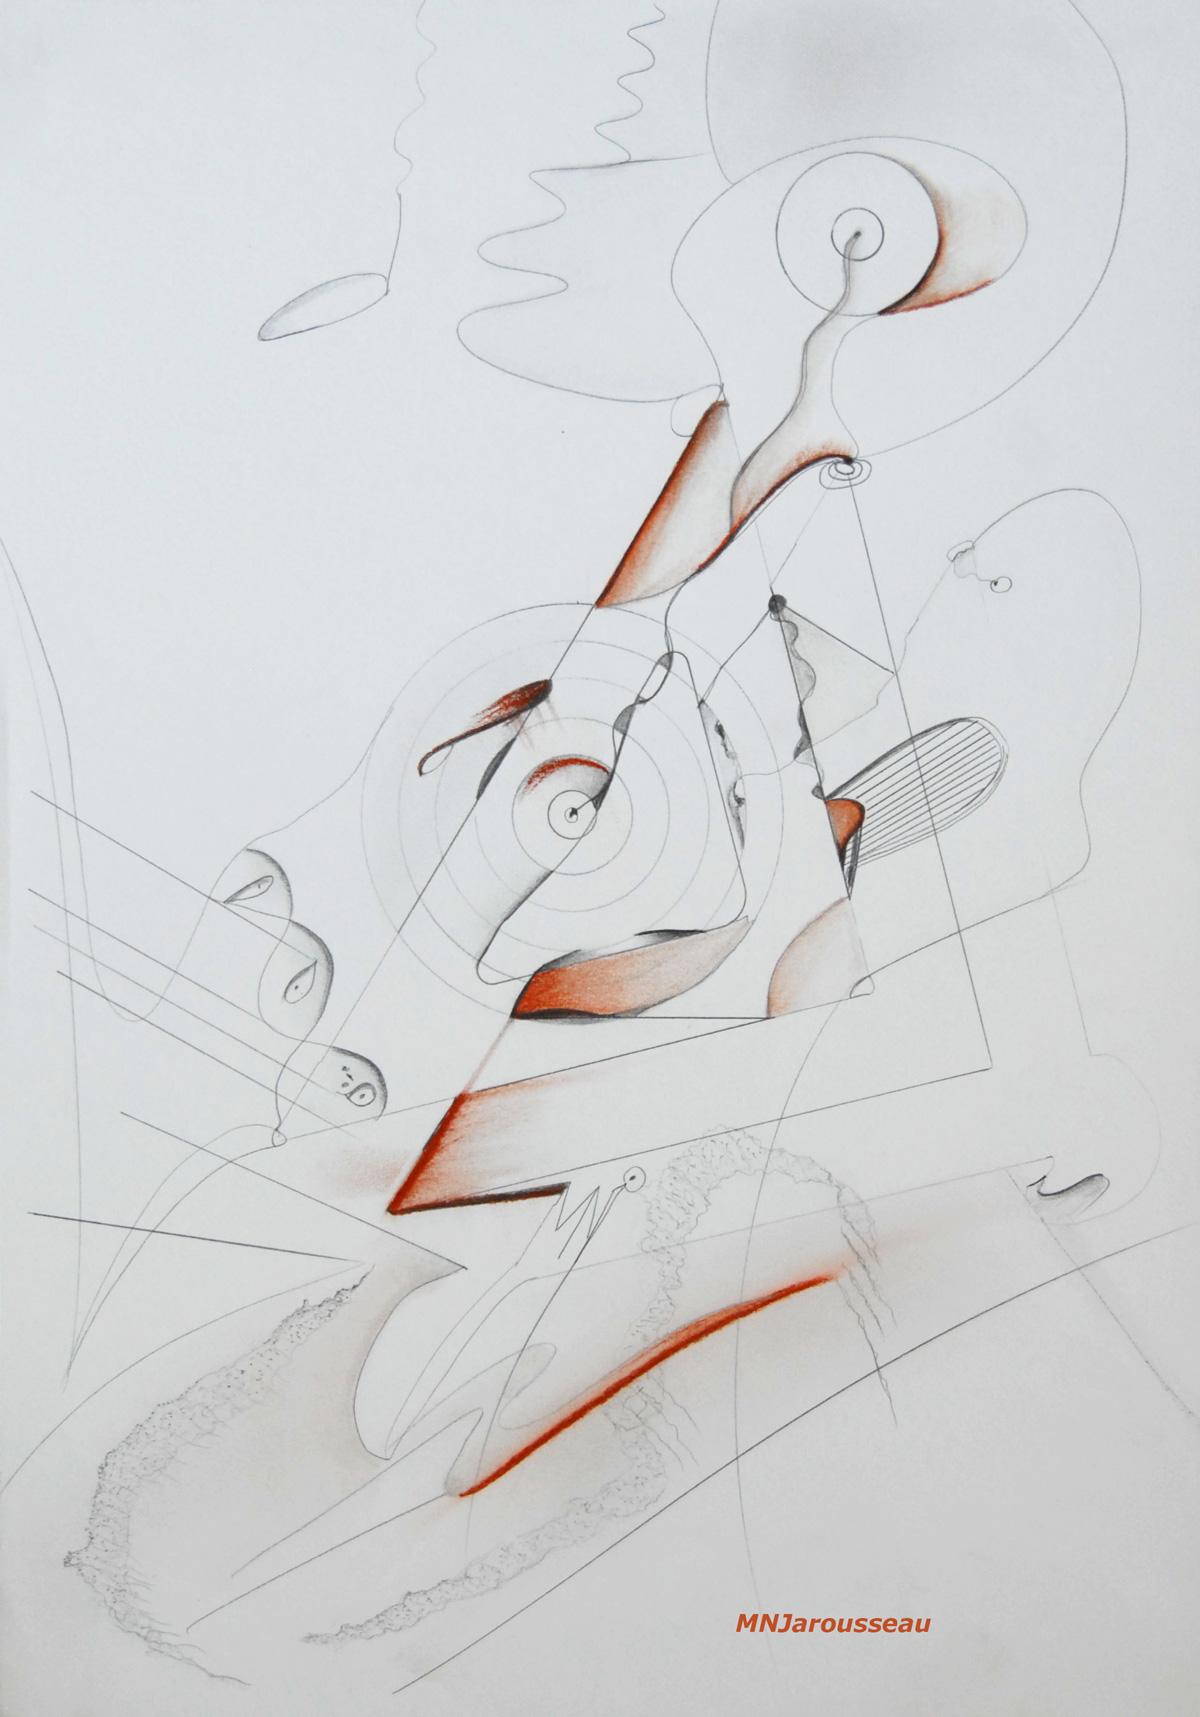 174 - LE ROBOT MELOMANE - crayon & pastel - 29,7 x-42